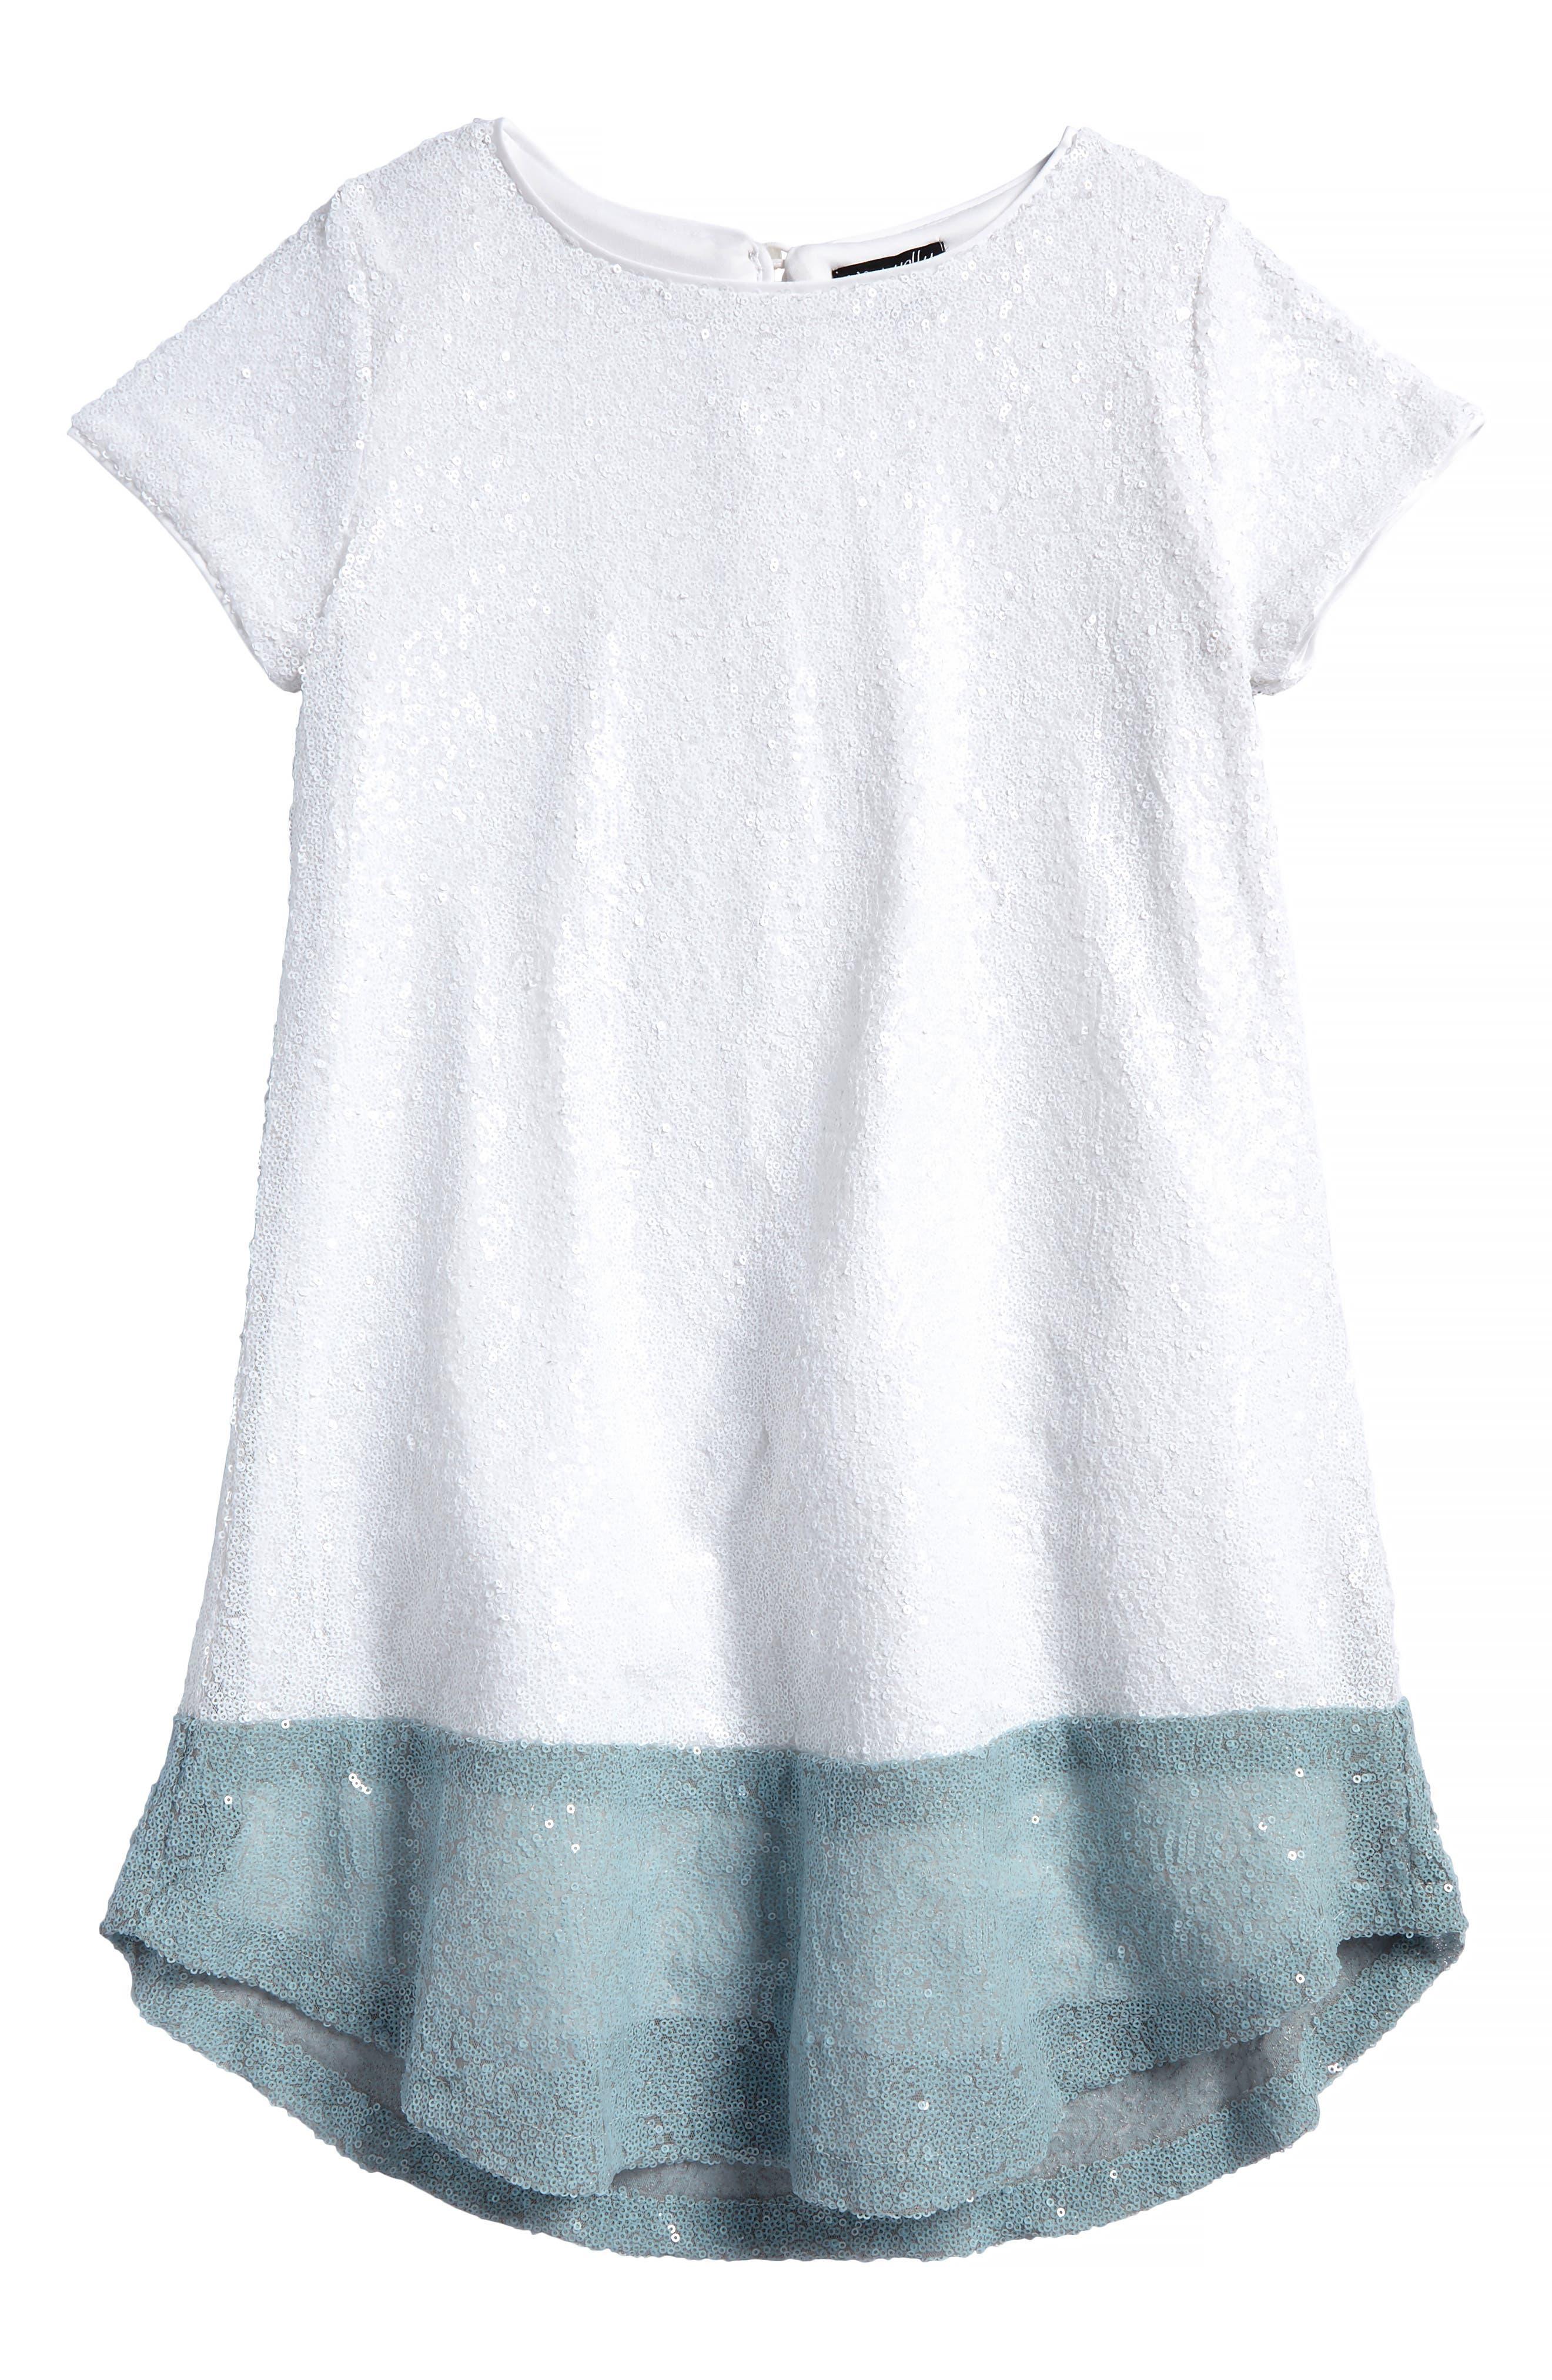 Alternate Image 1 Selected - Ava & Yelly Sequin Shift Dress (Big Girls)